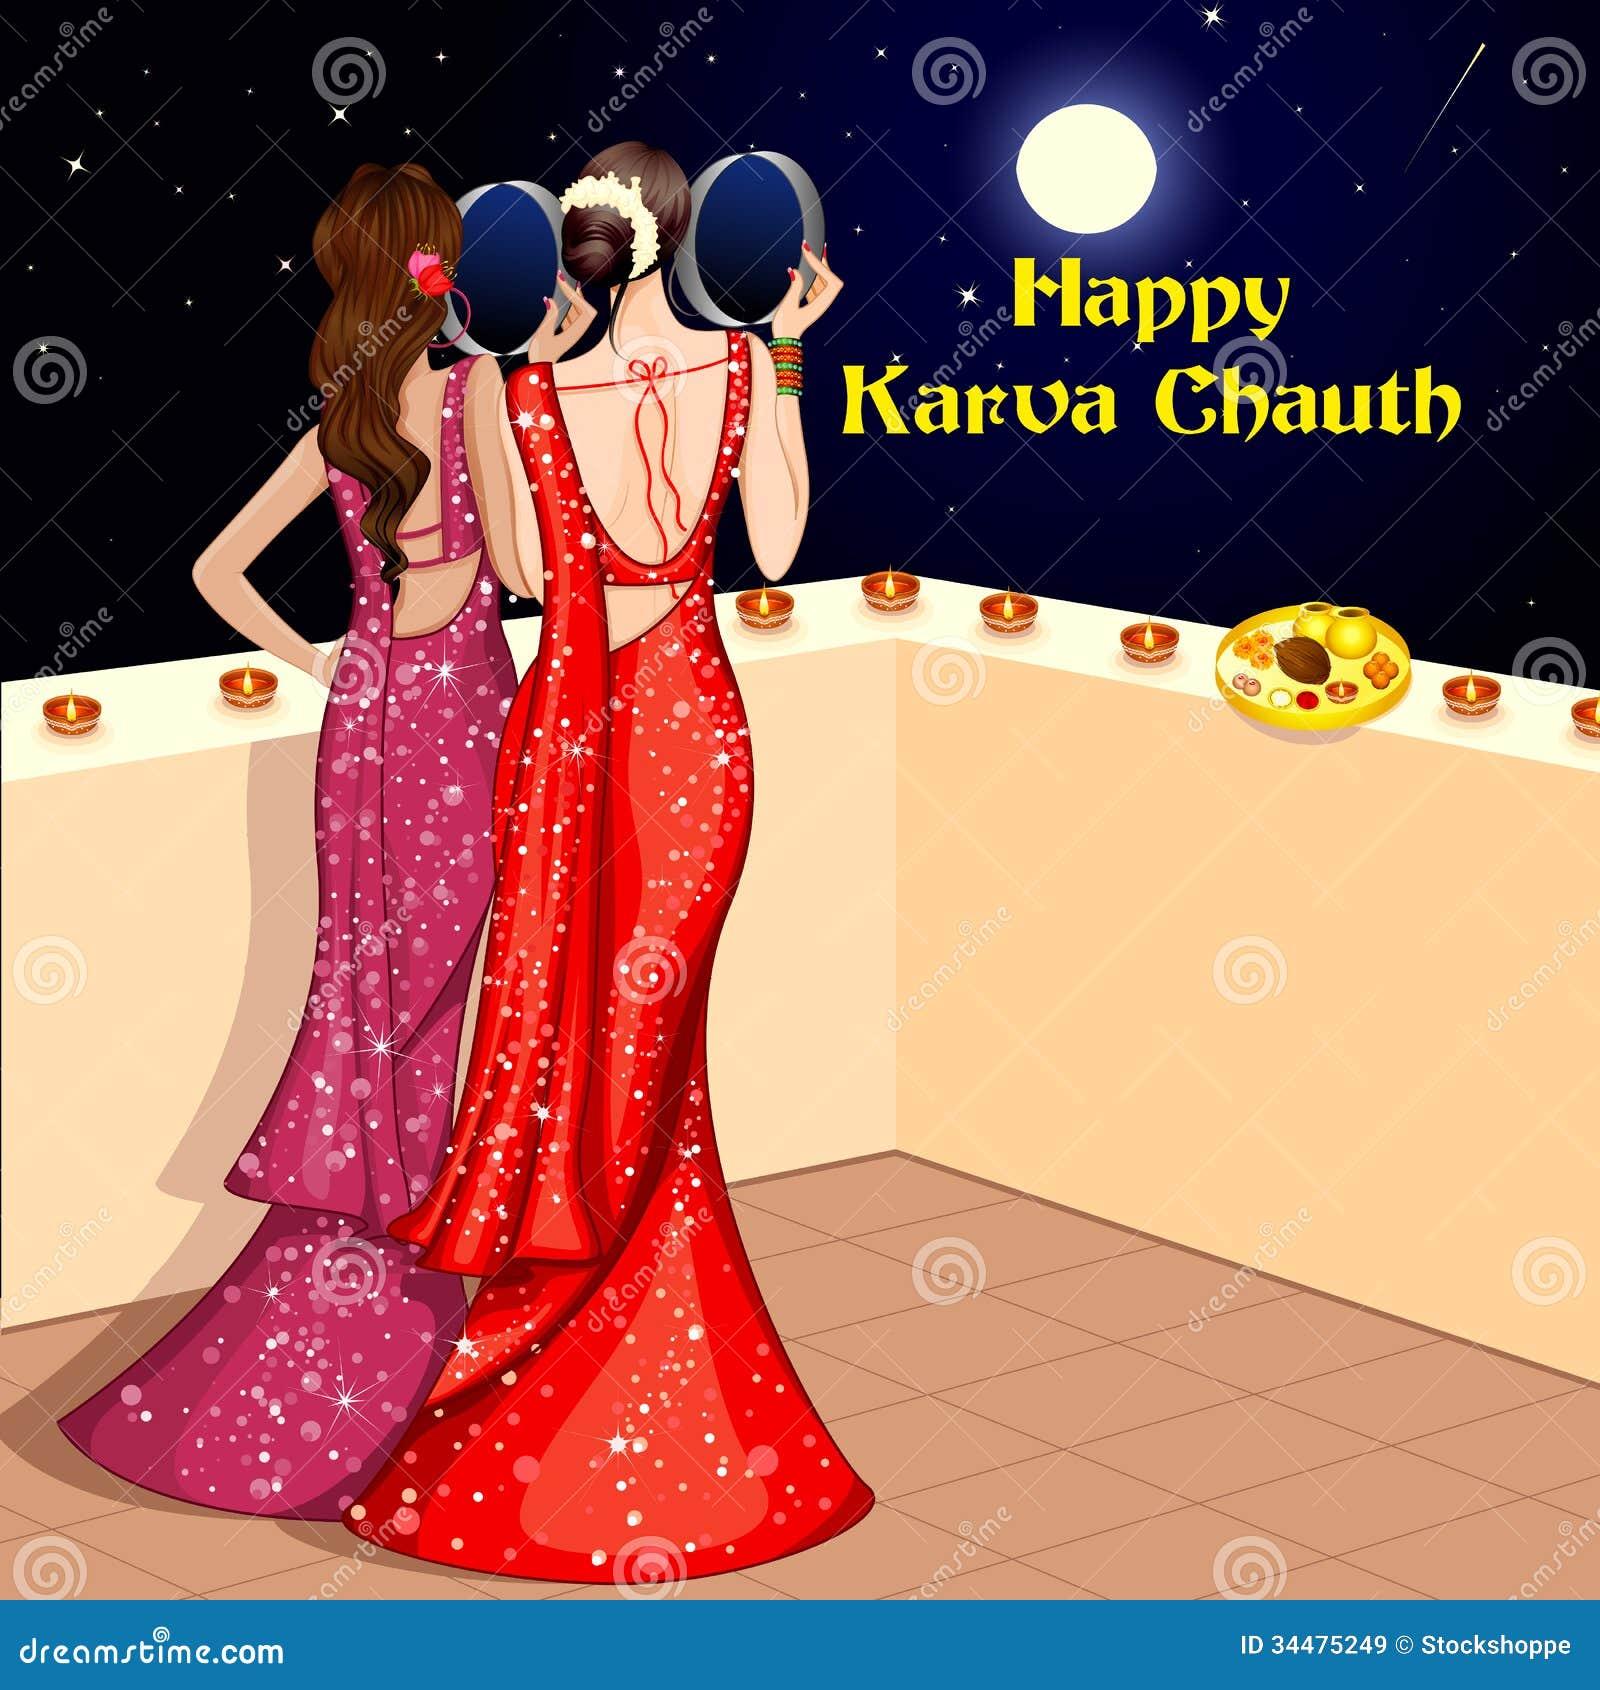 Indian Lady Celebrating Karwa Chauth Royalty Free Stock